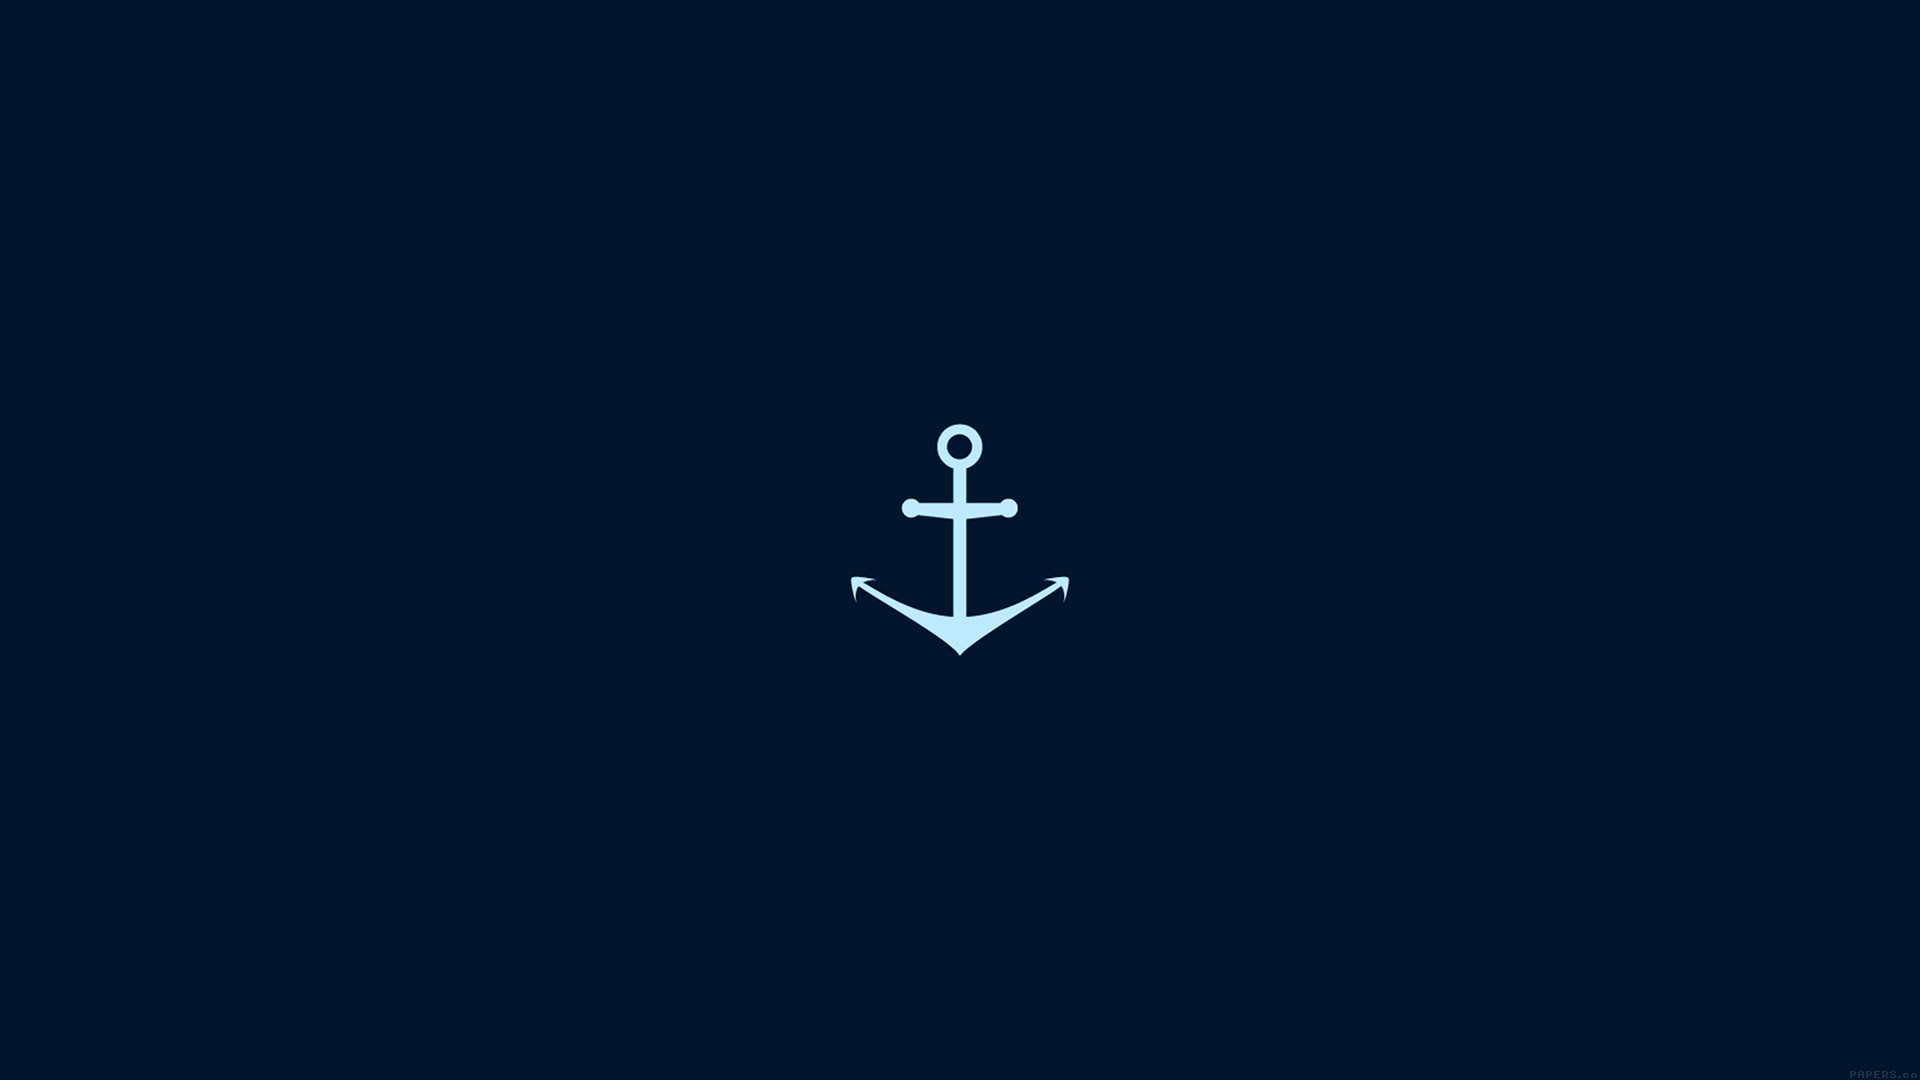 Wallpaper for desktop laptop ah28 minimal sea anchor for Minimal art logo